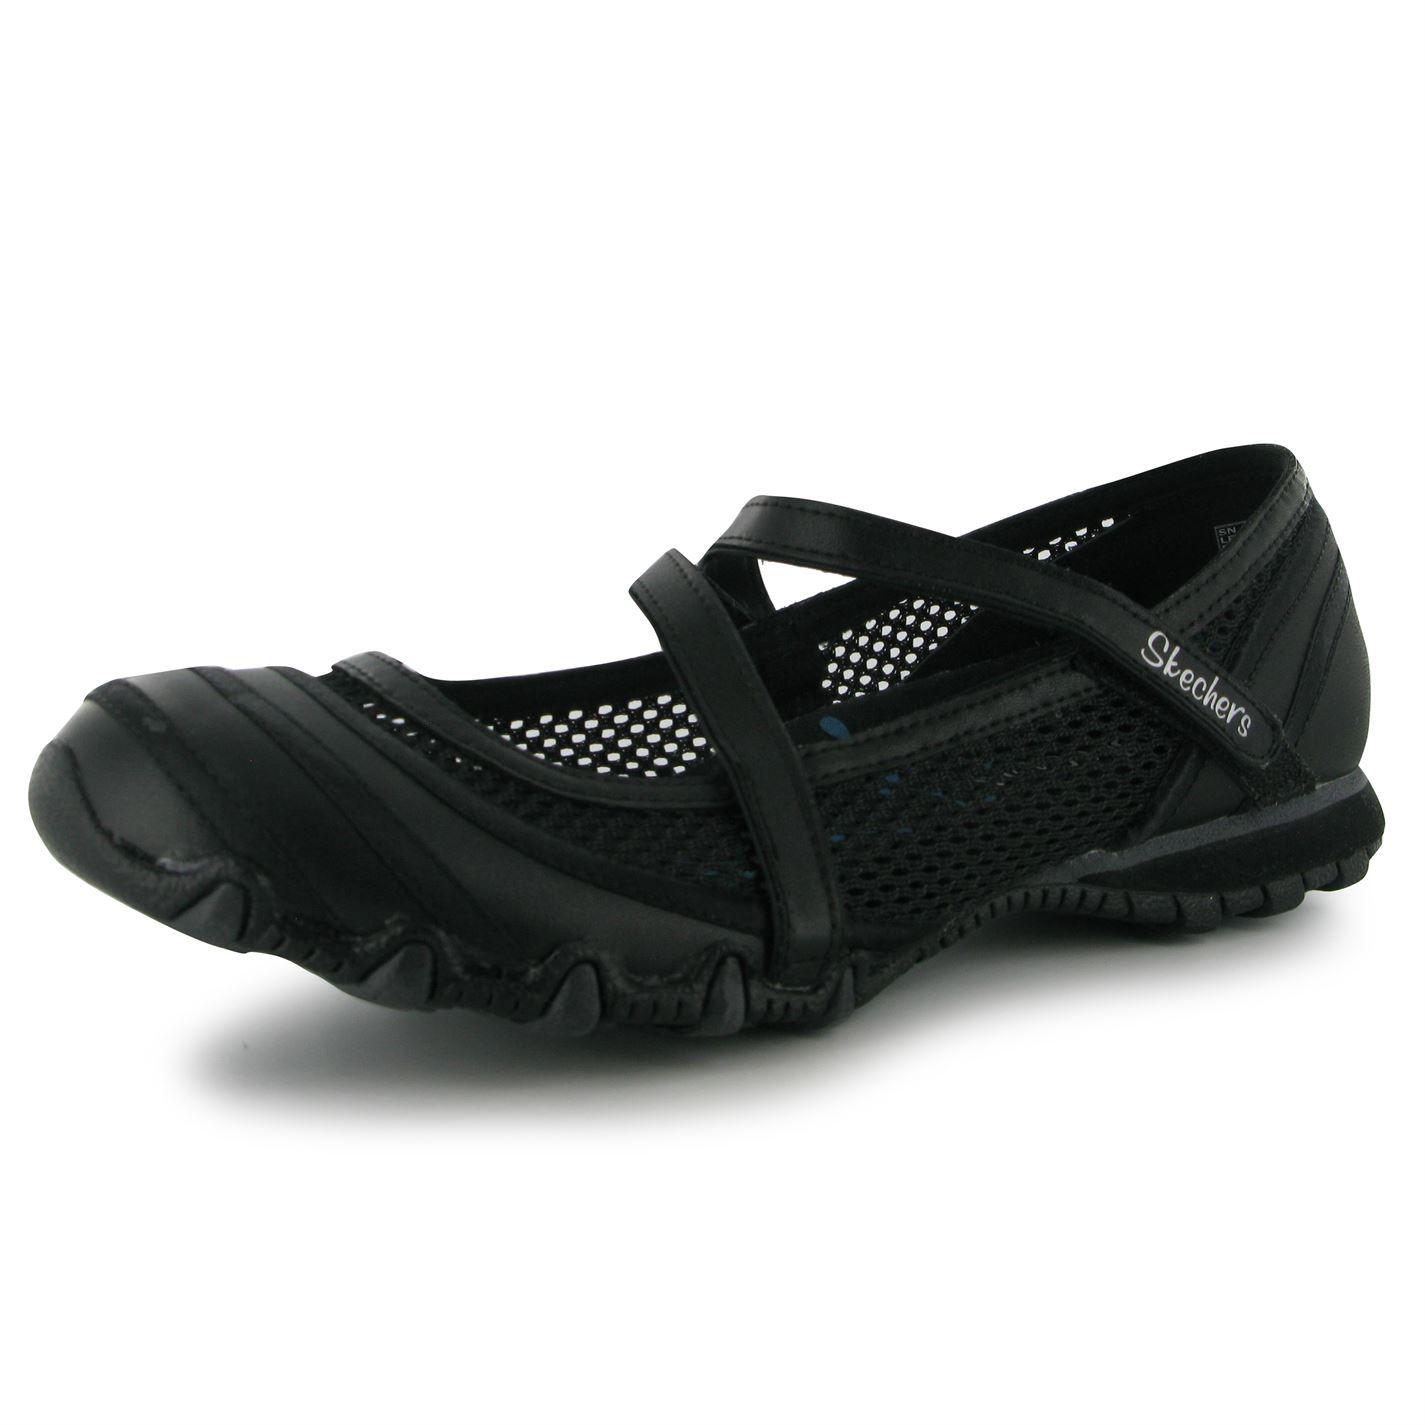 Skechers Canvas Shoes Biker Prop Ld53 Ladies